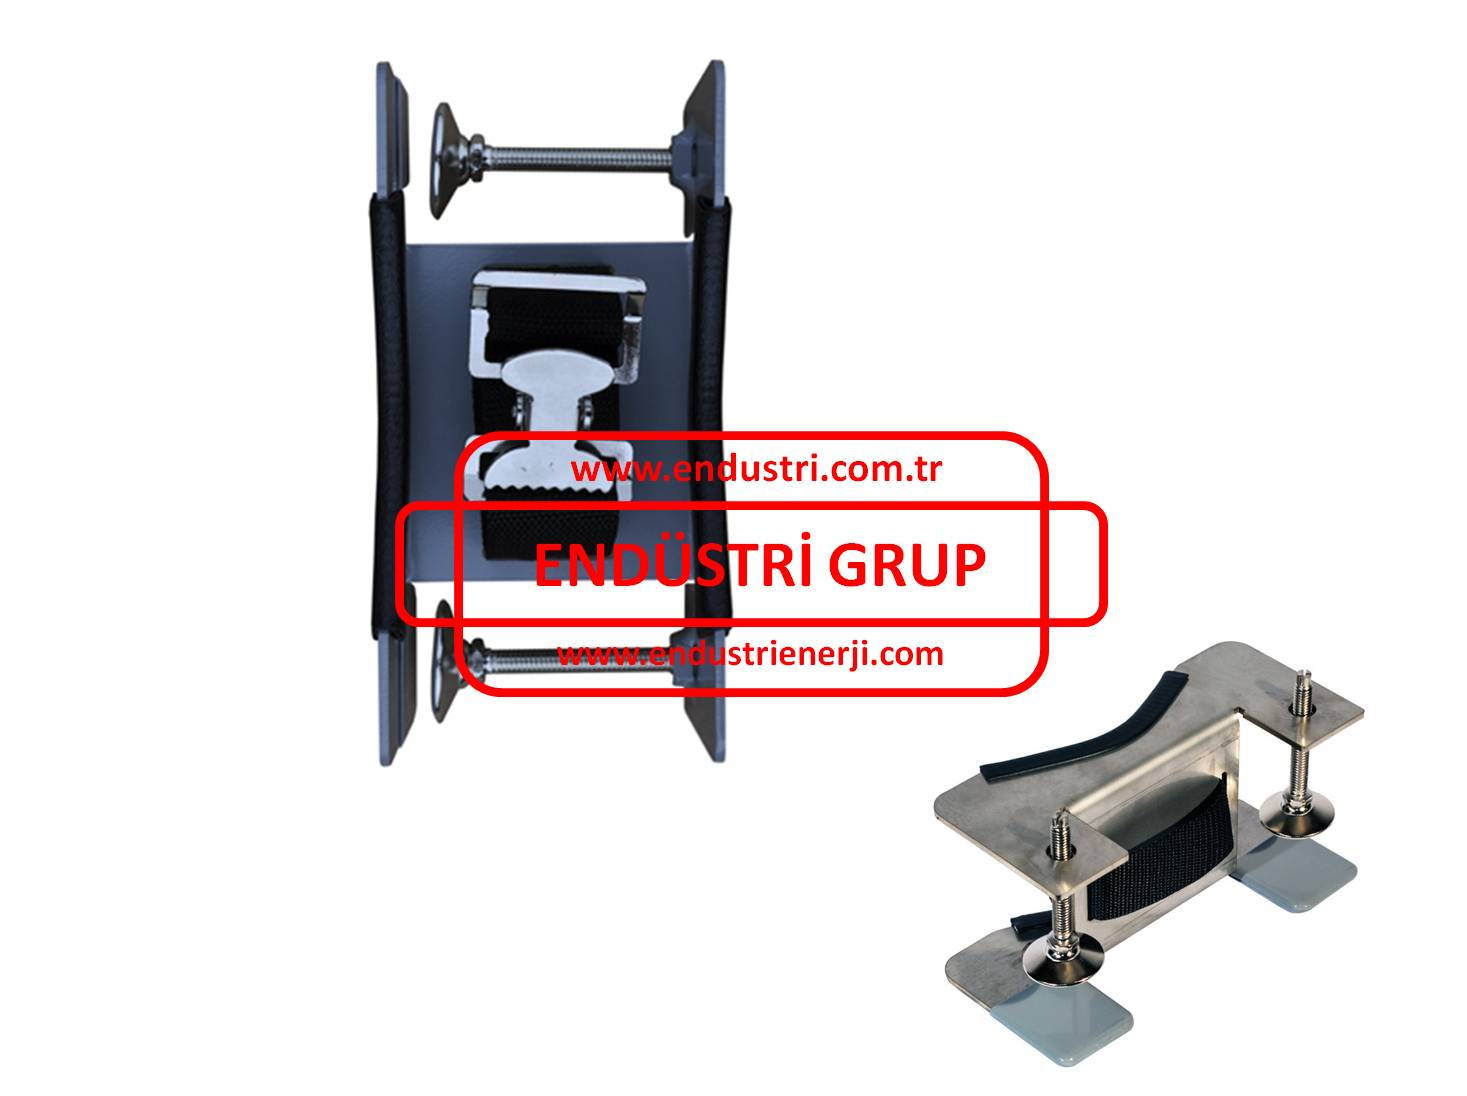 duvar-direk-kolon-seyyar-masa-yere-monteli-tipi-sanayi-oksijen-tupu-duvara-tup-sabitleme-koruma-baglama-standi-aparati-braketi-sabitleyici-zinciri